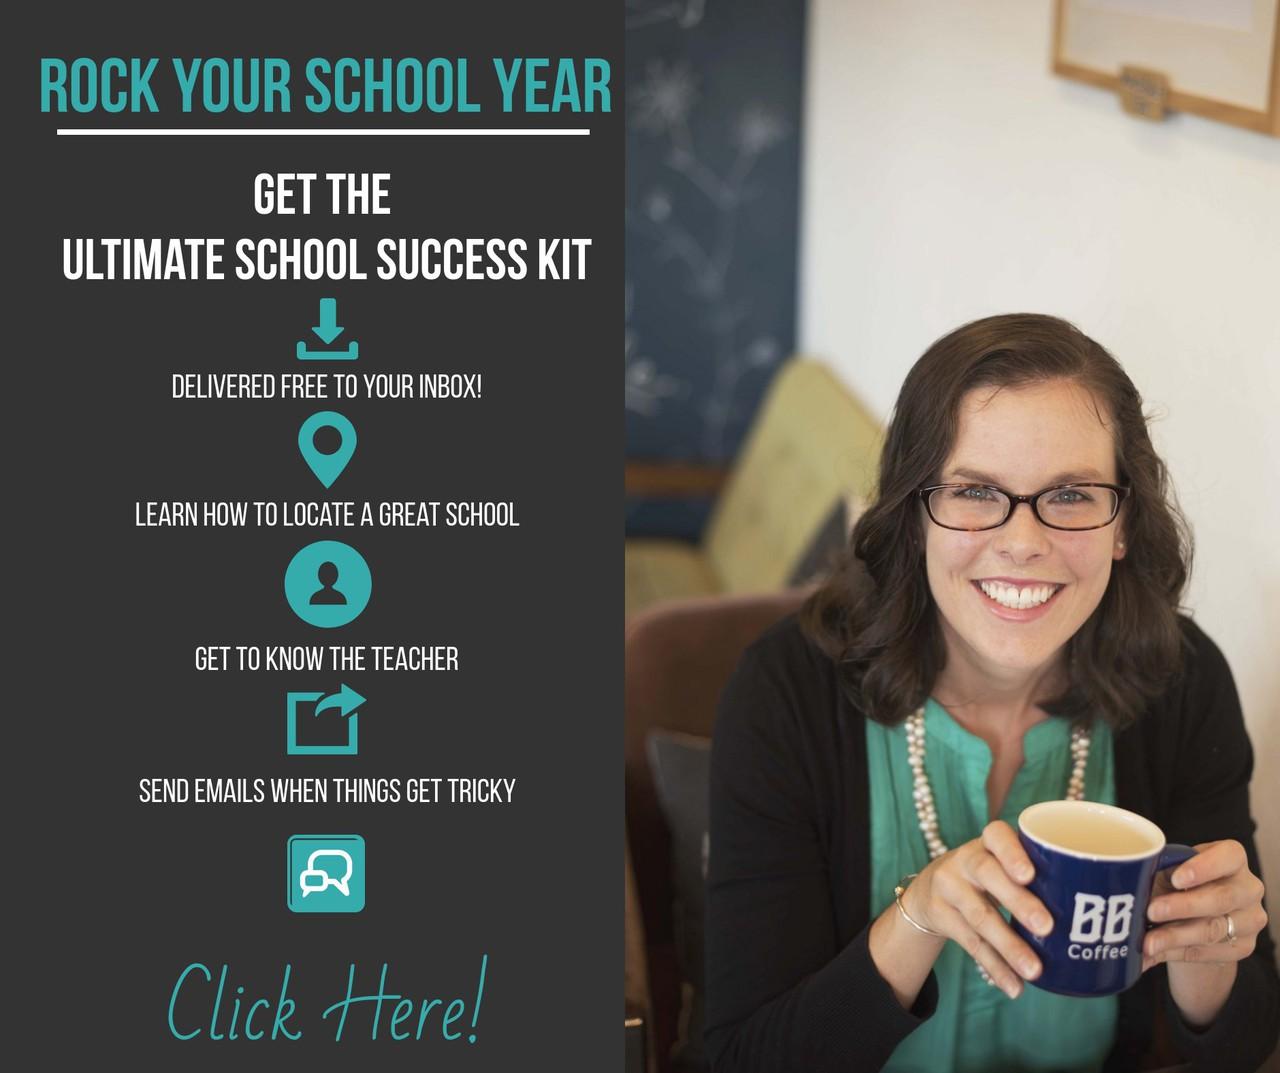 MilKids Ed, Education, K-12, Ultimate School Success Kit, Free download, meg flanagan